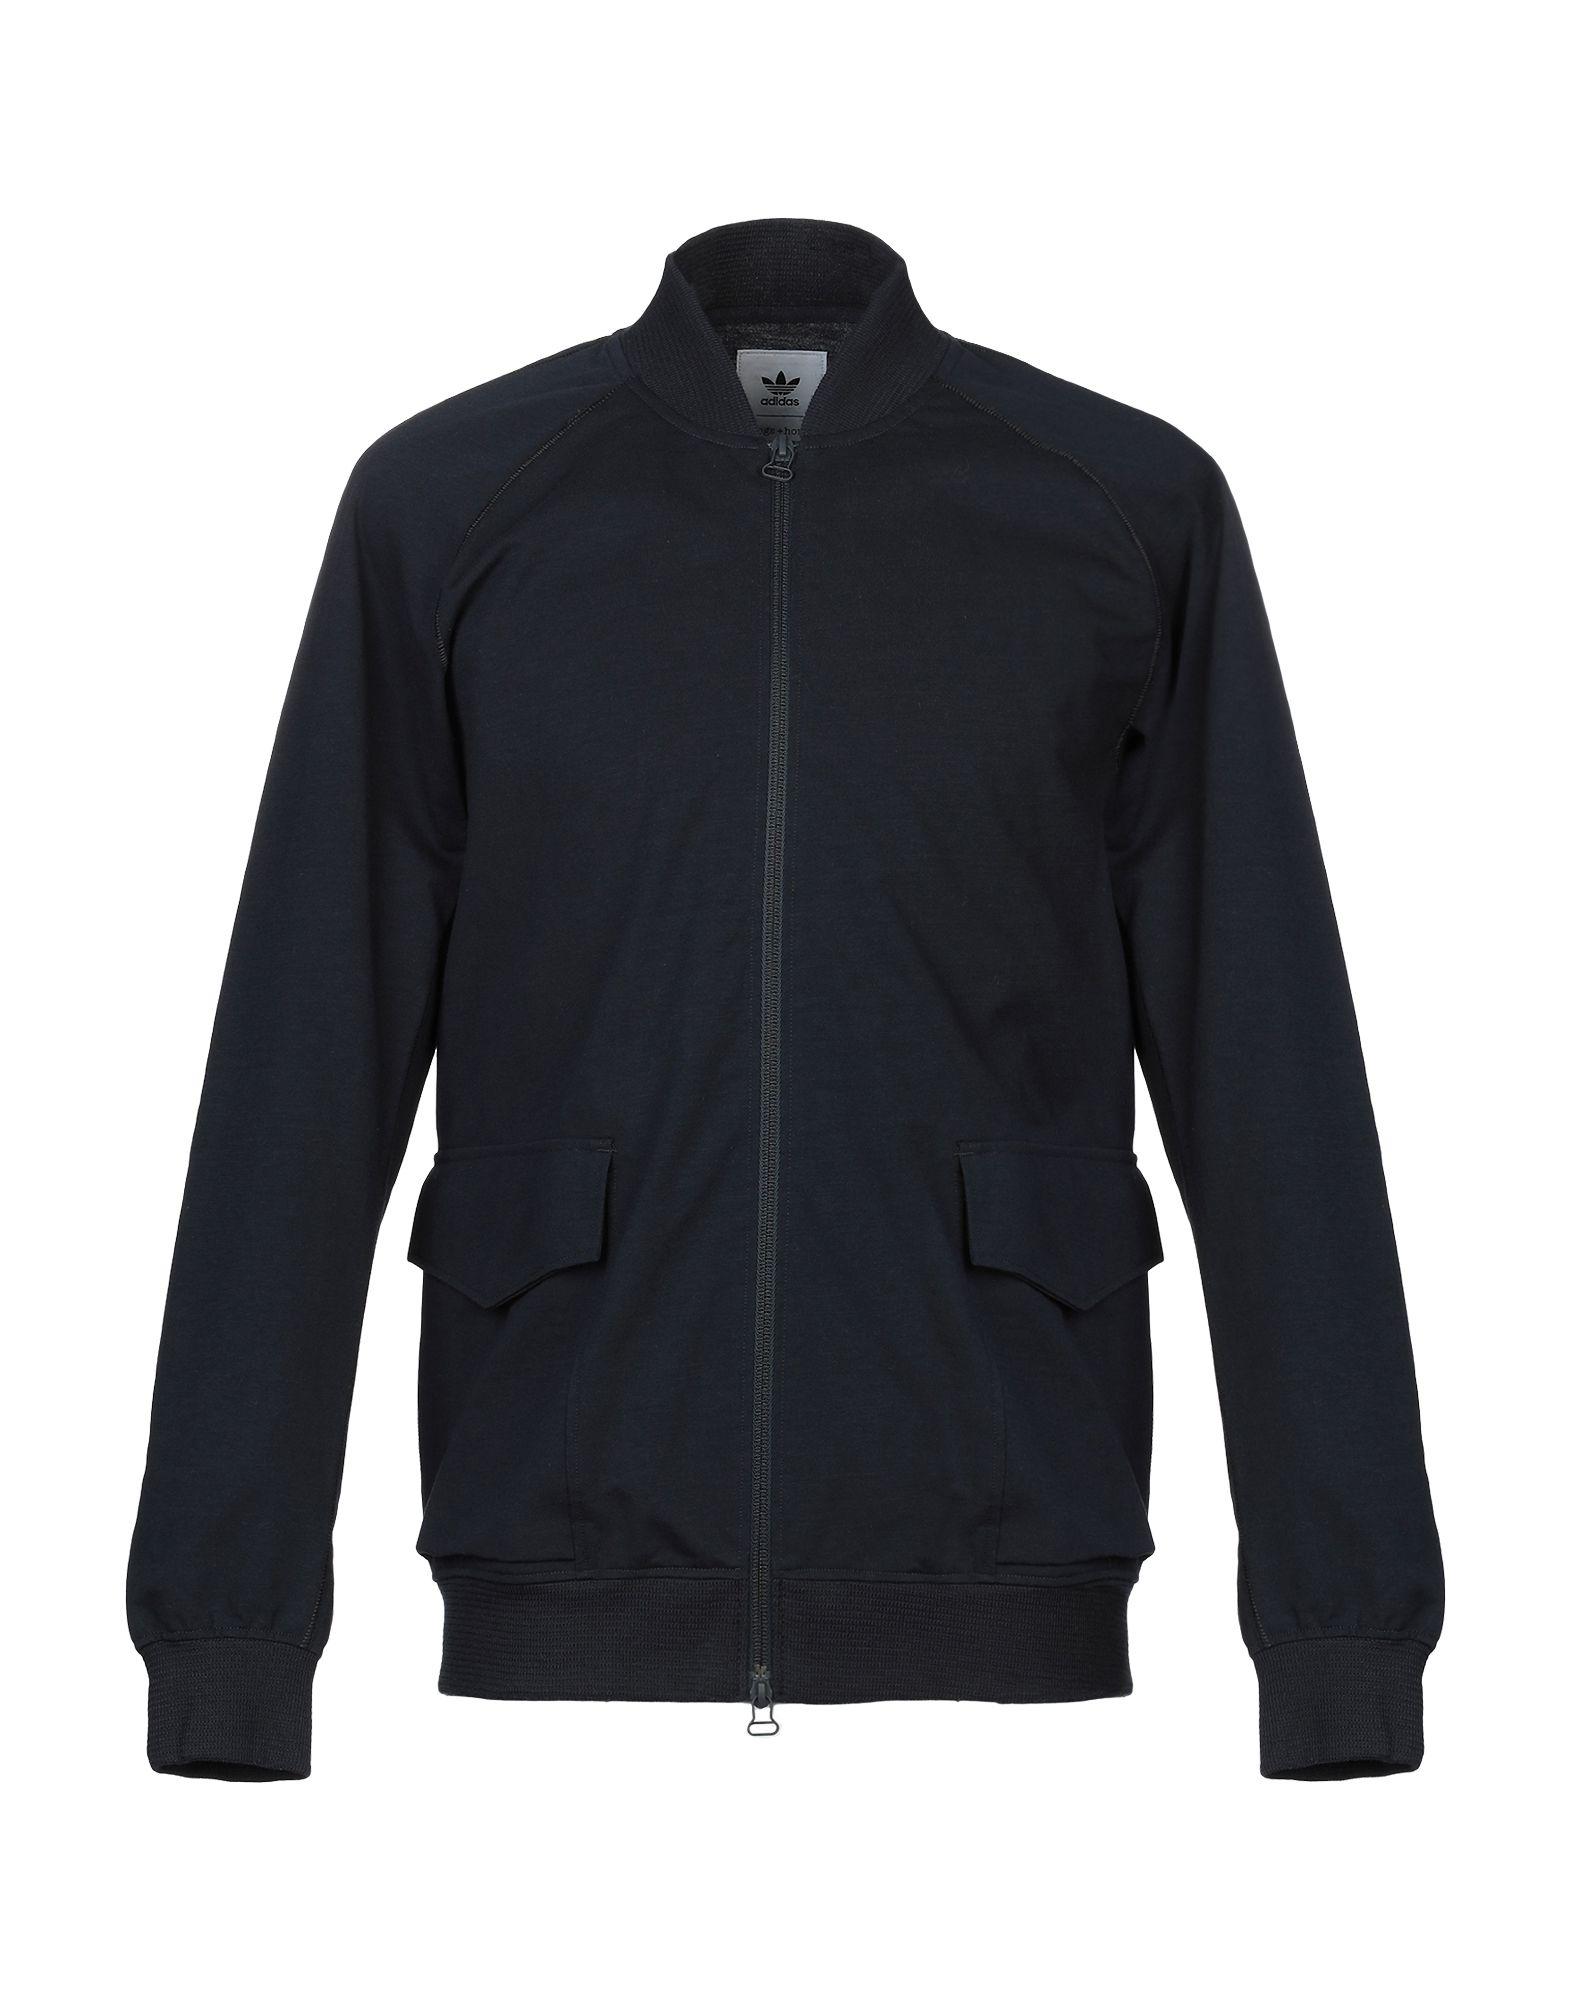 ADIDAS ORIGINALS Куртка куртки adidas куртка бомбер муж tko jacket m utiblk